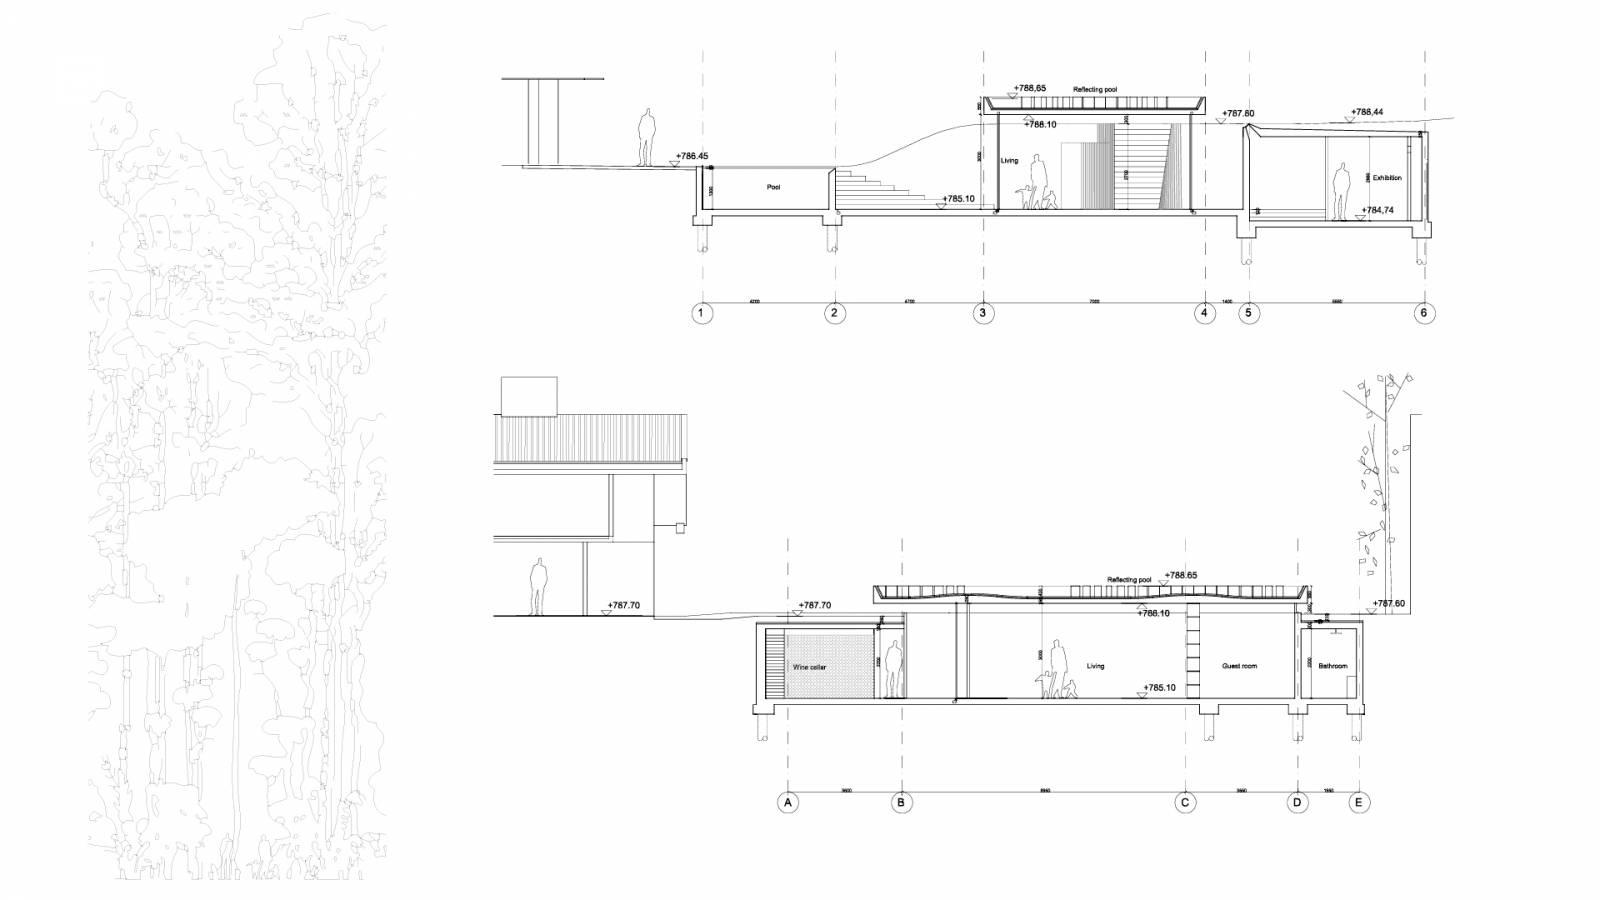 SECTION OF SUNKEN PAVILLION - São Paulo Art Pavillion - SPOL Architects